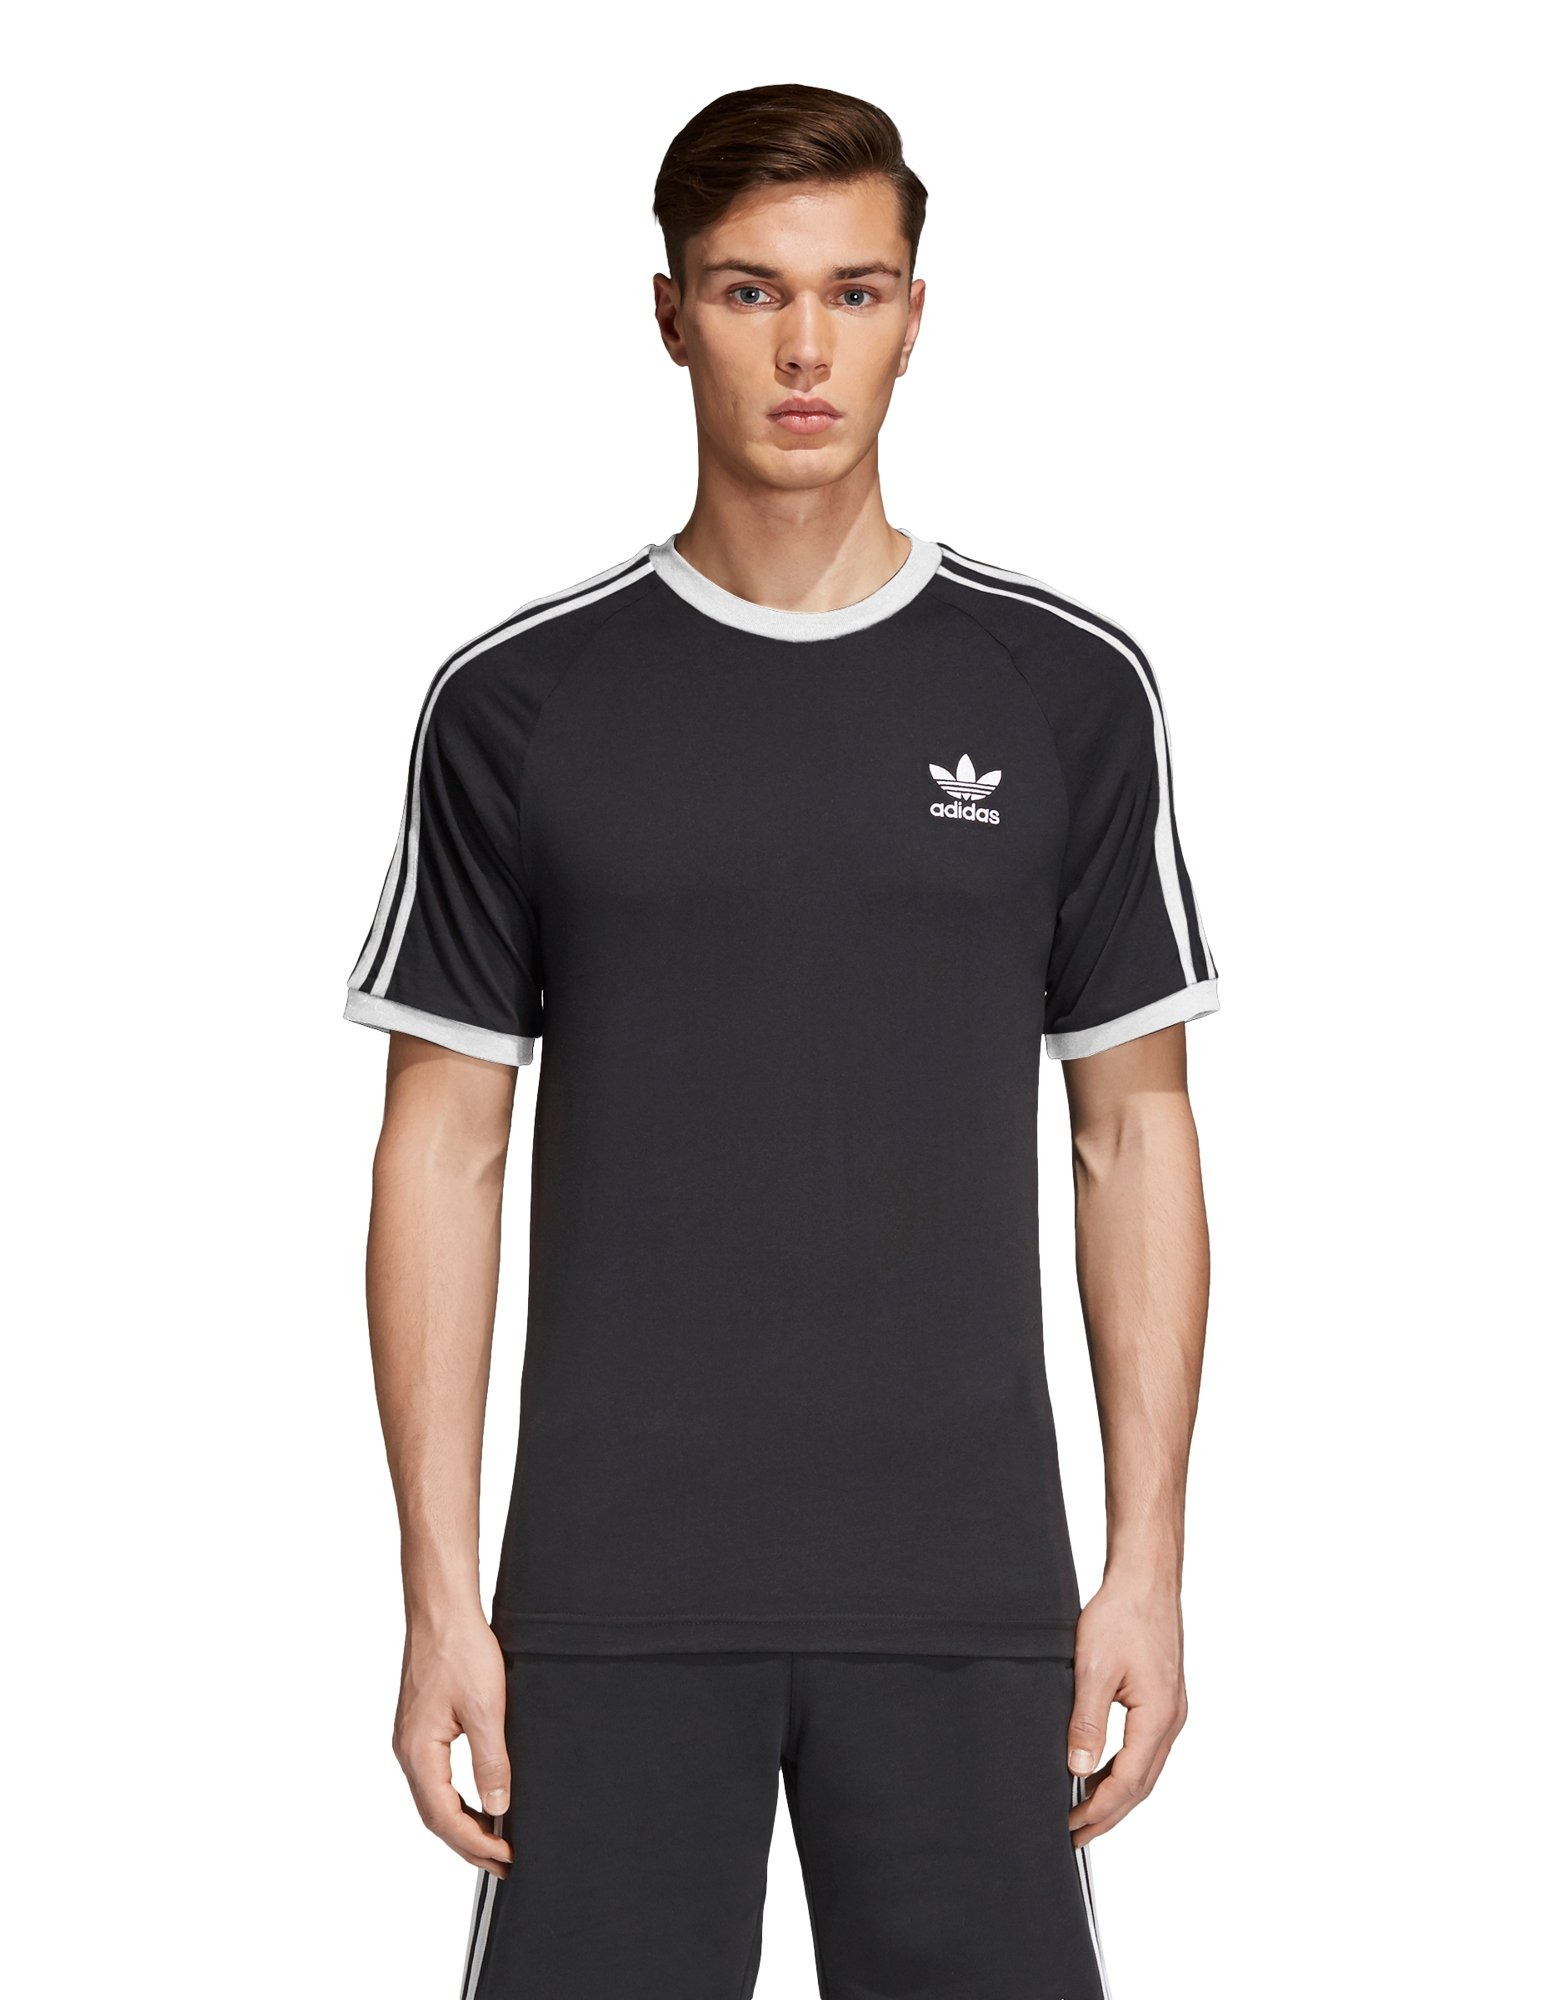 adidas Originals California Short Sleeve T Shirt Black